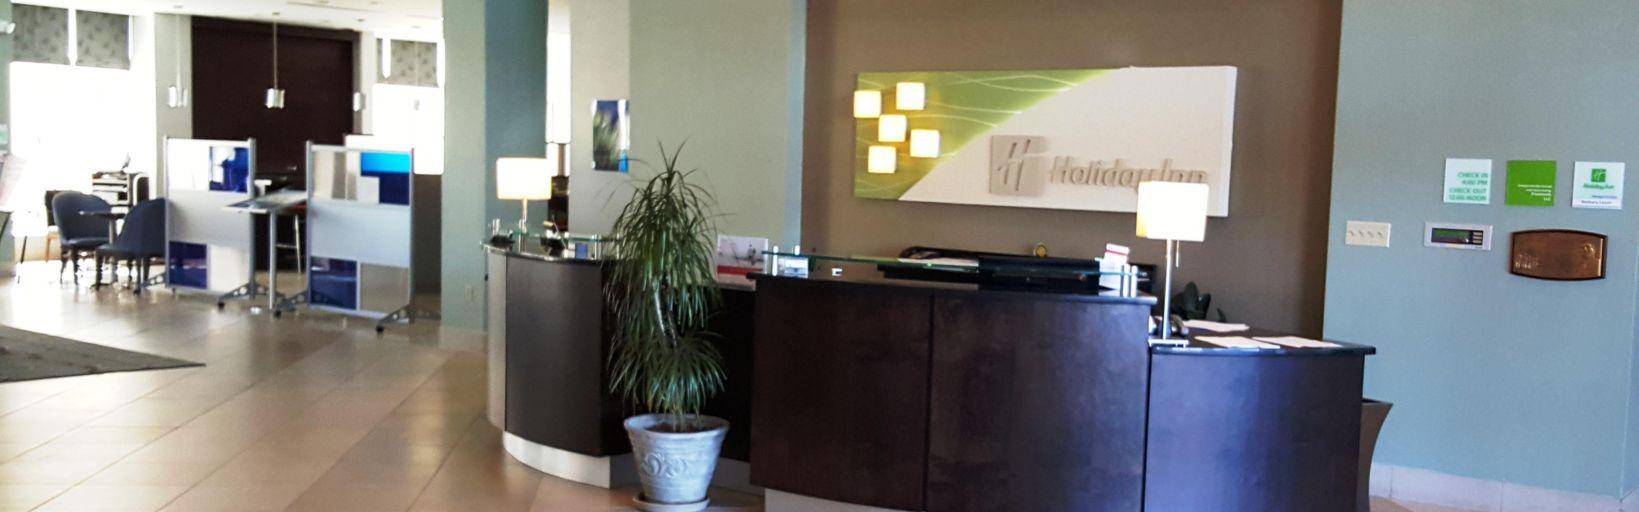 Holiday inn santee hotel by ihg welcome to holiday inn santee south carolina solutioingenieria Images